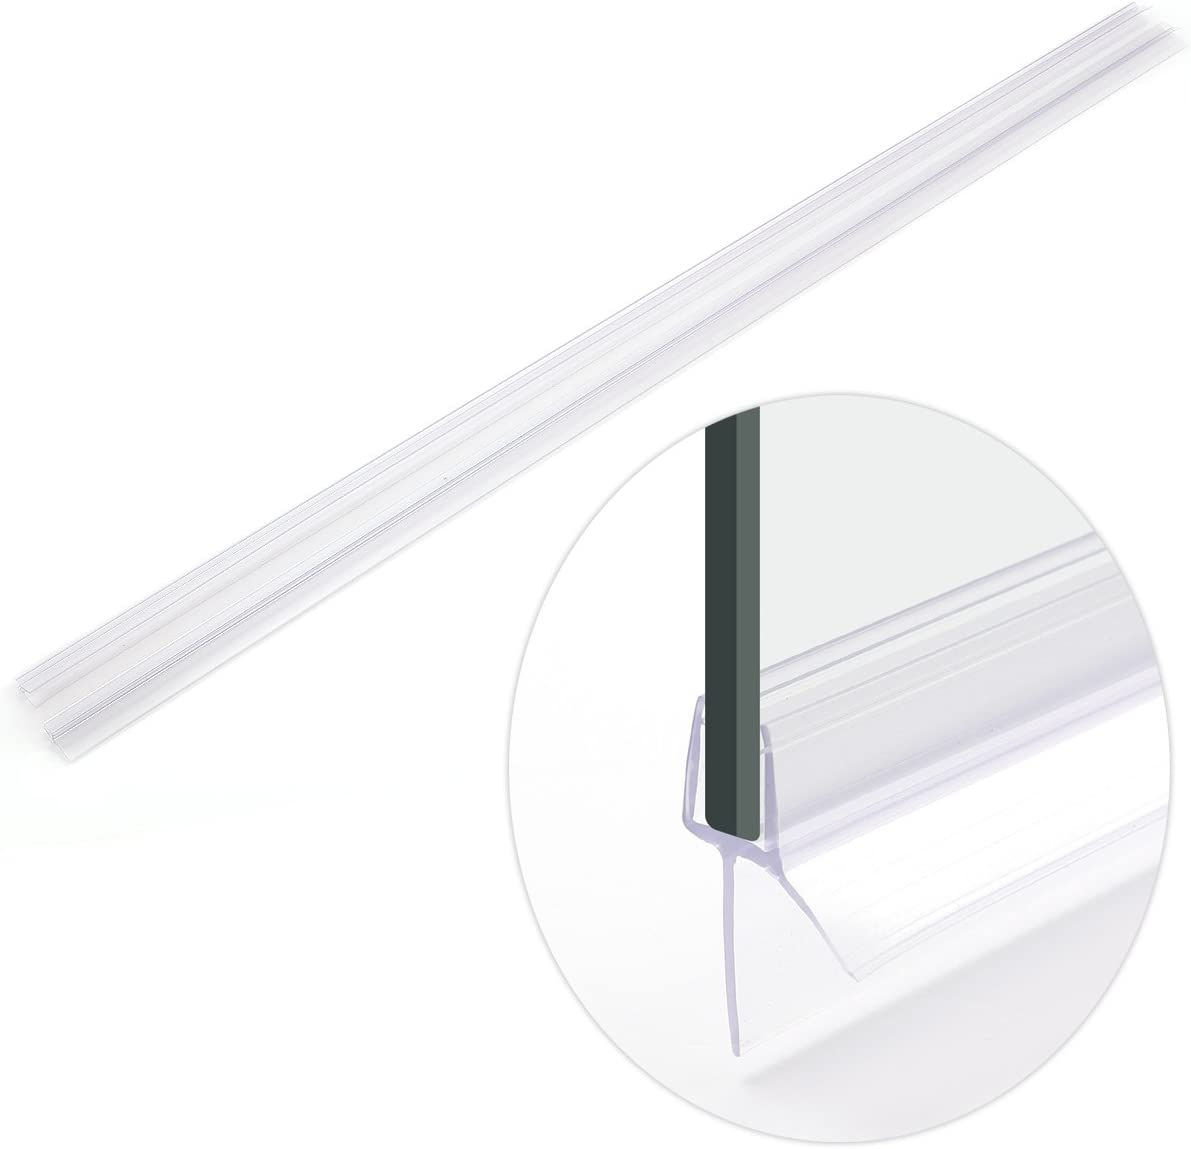 Junta para Mampara de Ducha PVC Burlete mampara de baño Ducha Vierteaguas para Vidrio de 4-6-8mm 2pcs 90cm(para Vidrio 6-8mm): Amazon.es: Hogar